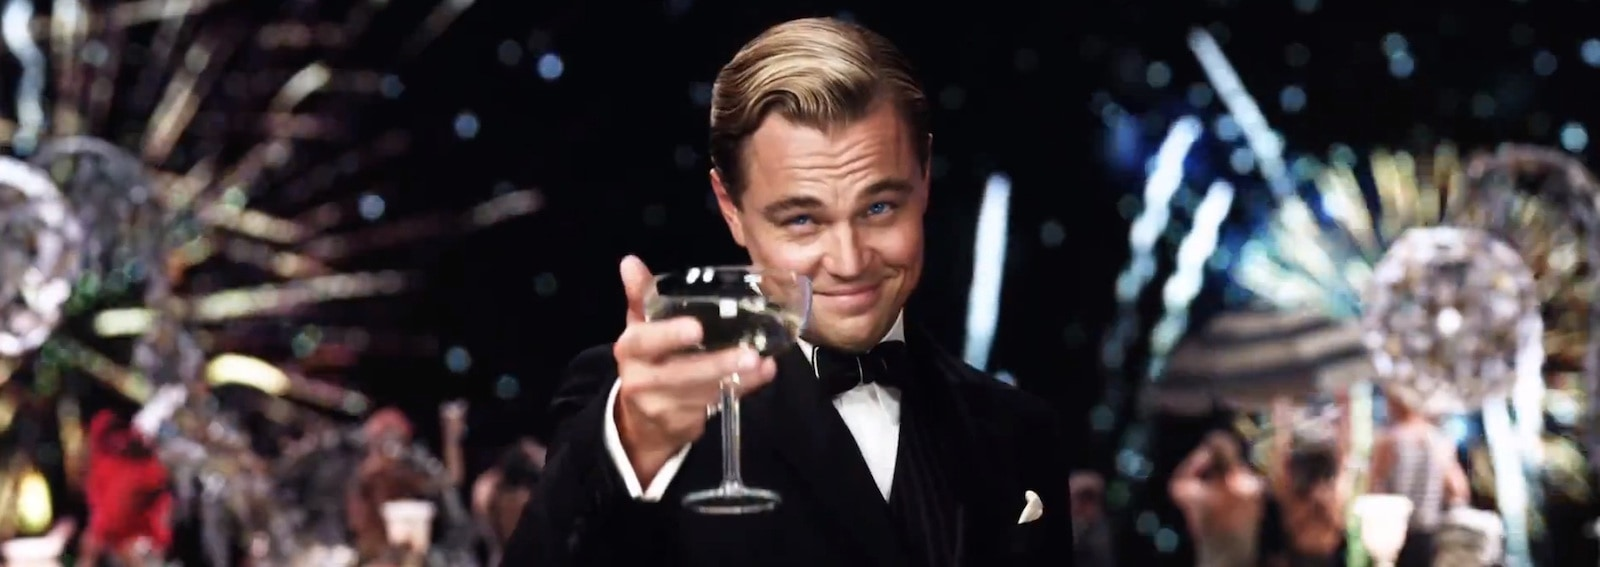 Leonardo Di Caprio smoking